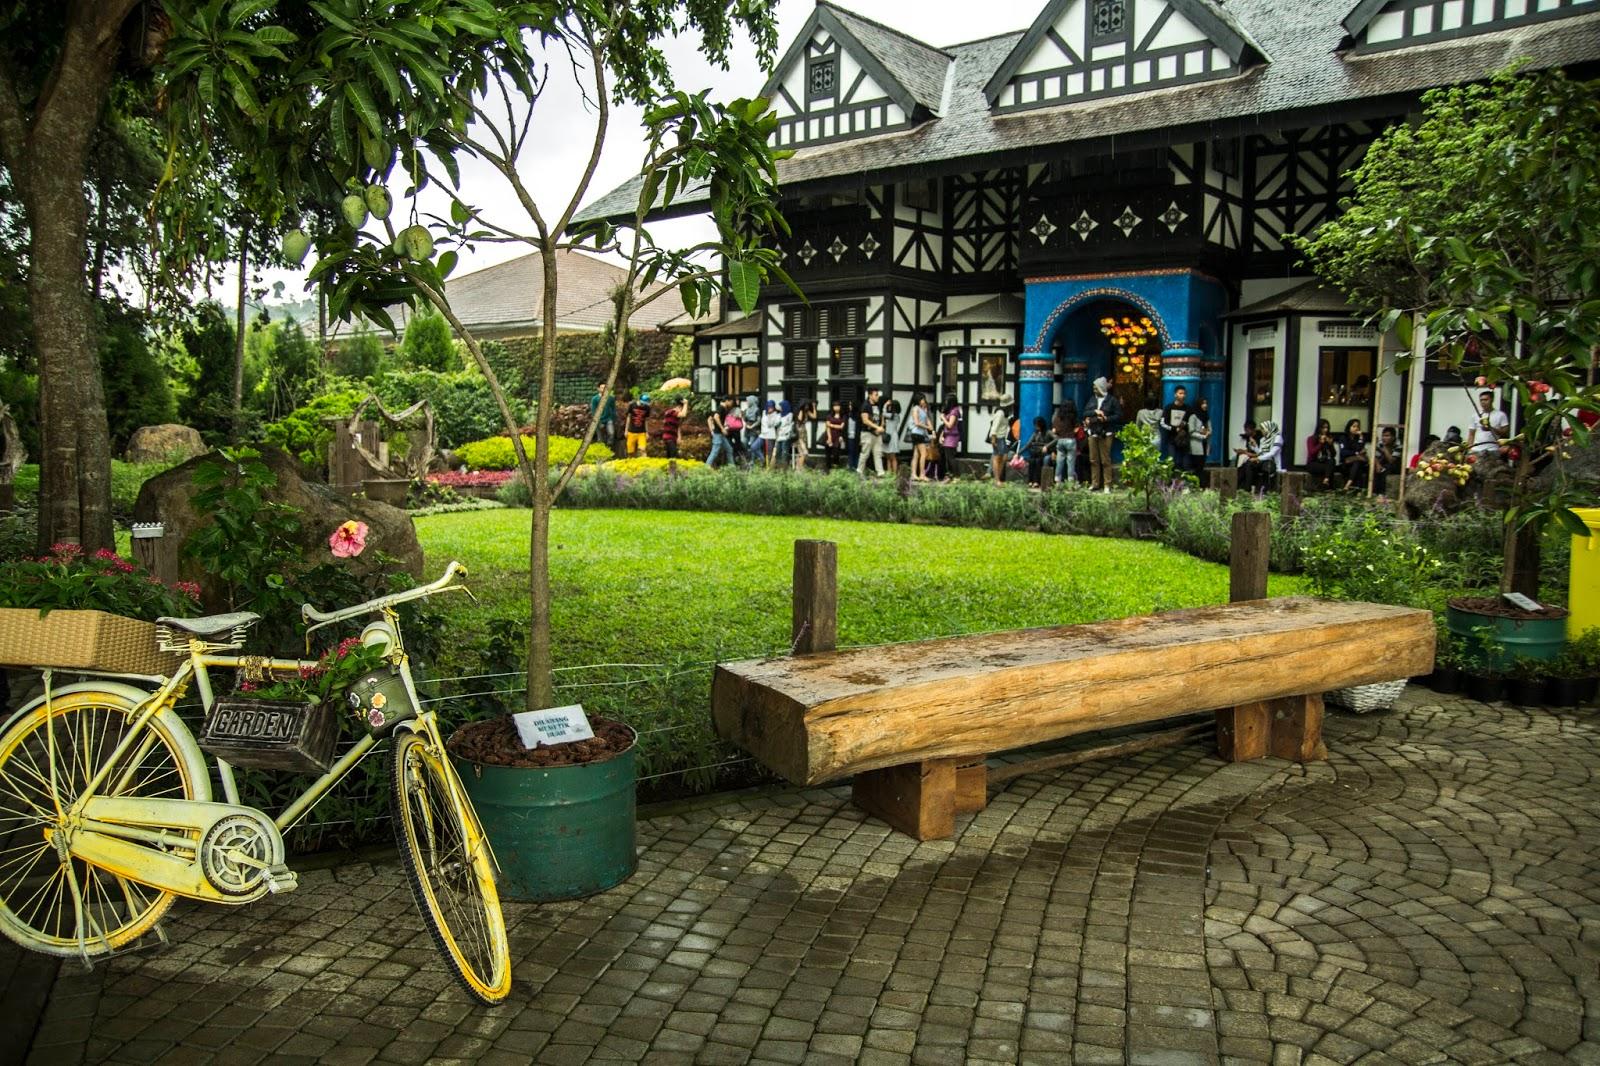 10 Wisata Edukasi Di Bandung Yang Wajib Di Kunjungi